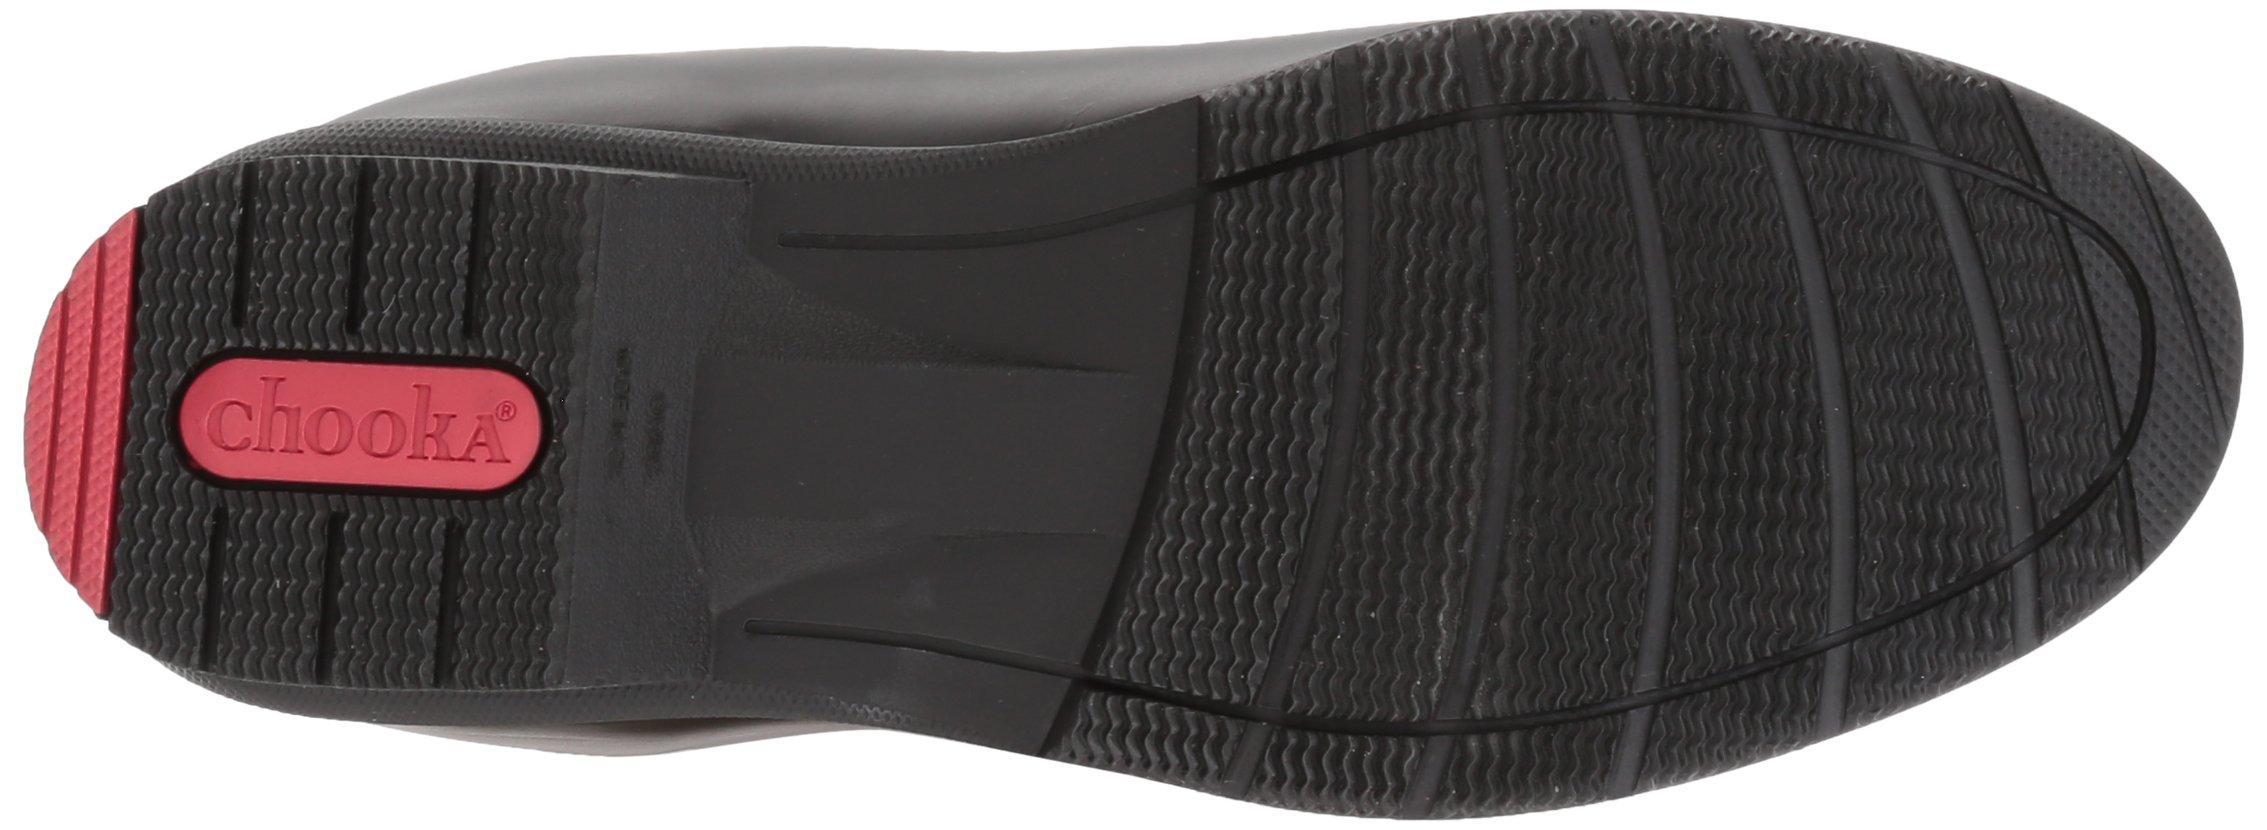 Chooka Women's Tall Memory Foam Rain Boot, Black, 7 M US by Chooka (Image #3)